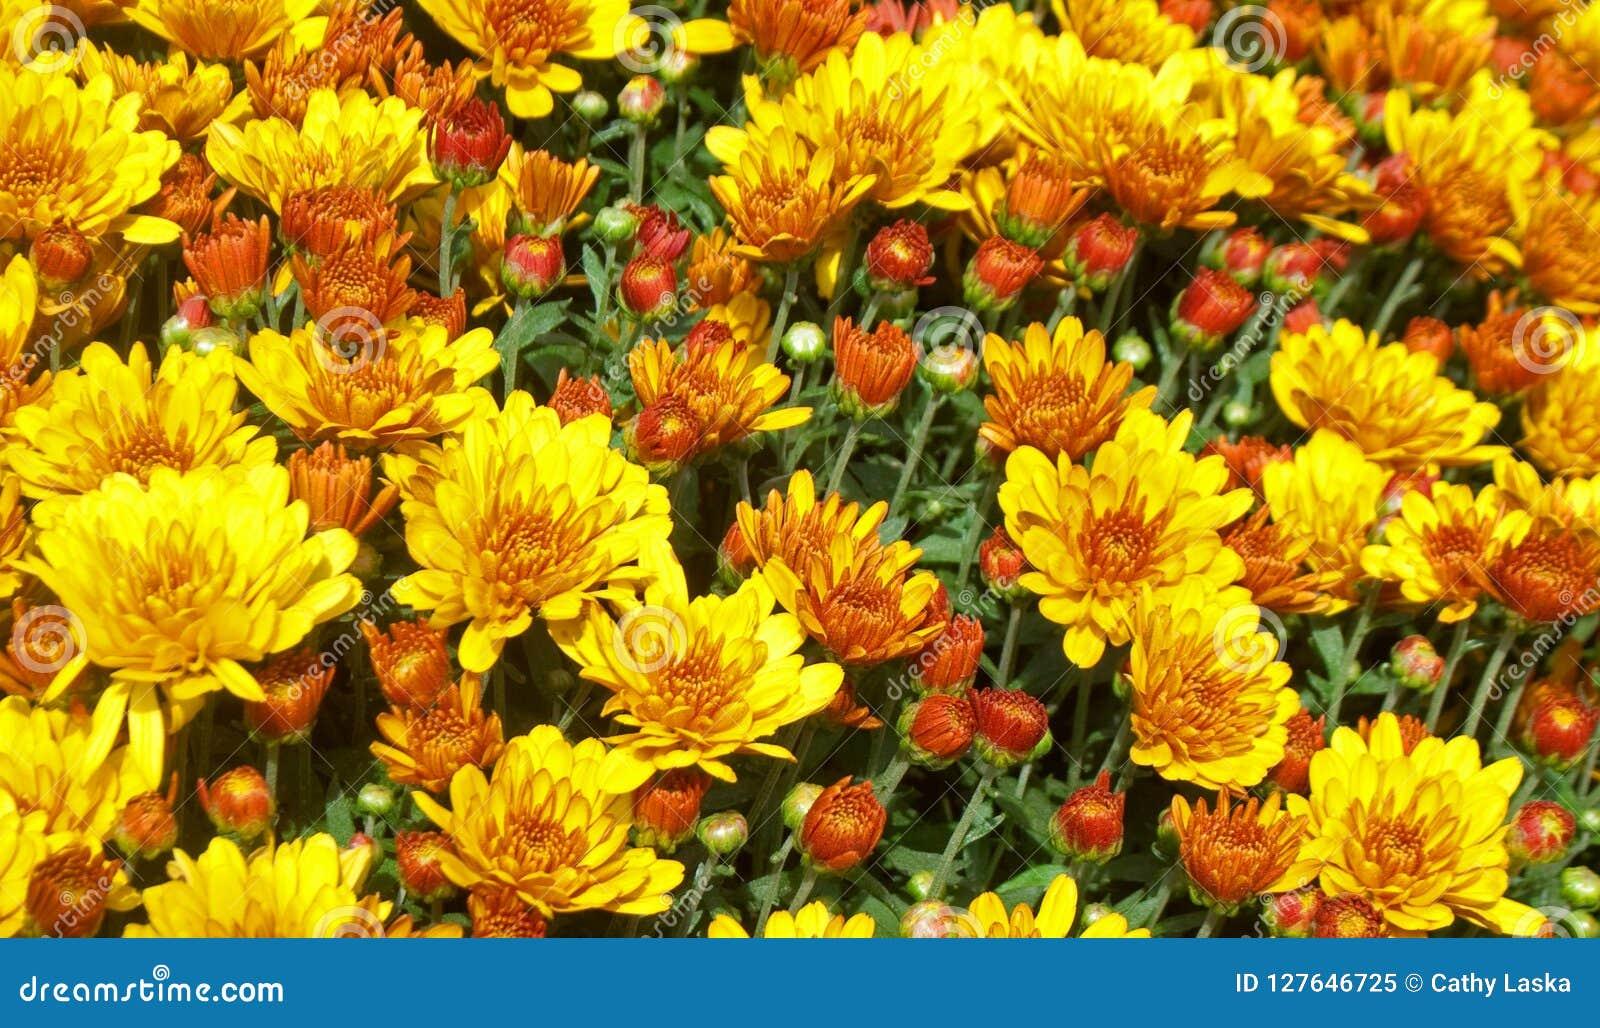 Yellow And Orange Mum Flower Garden Stock Image Image Of Beautiful Colorful 127646725